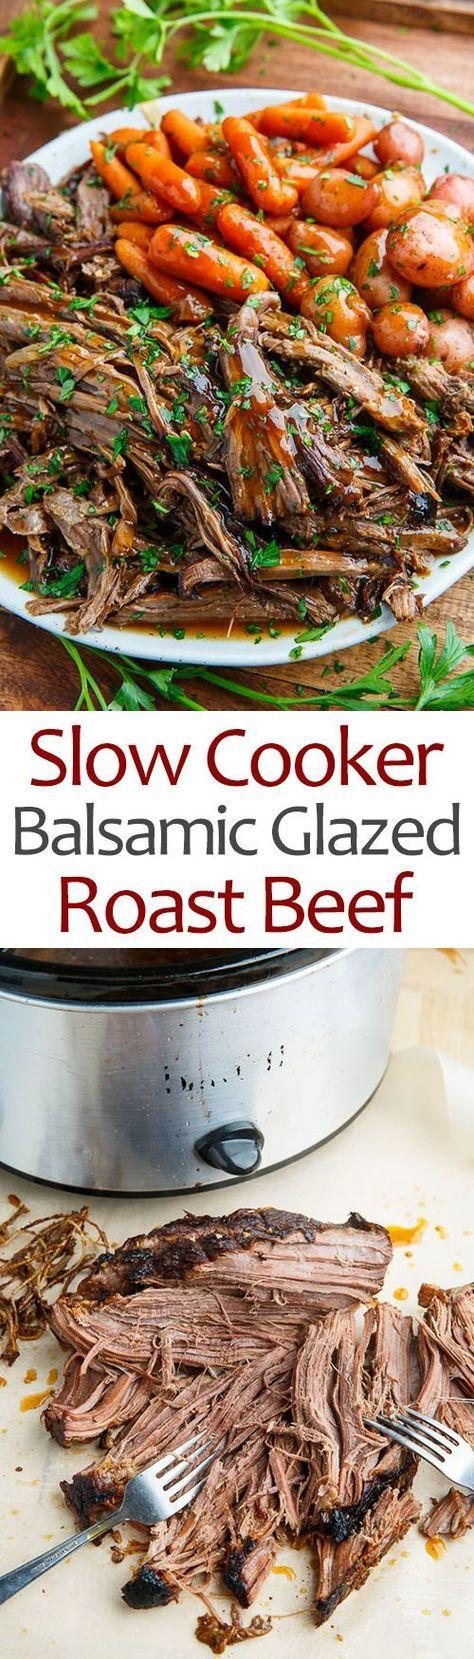 nötkött slow cooker